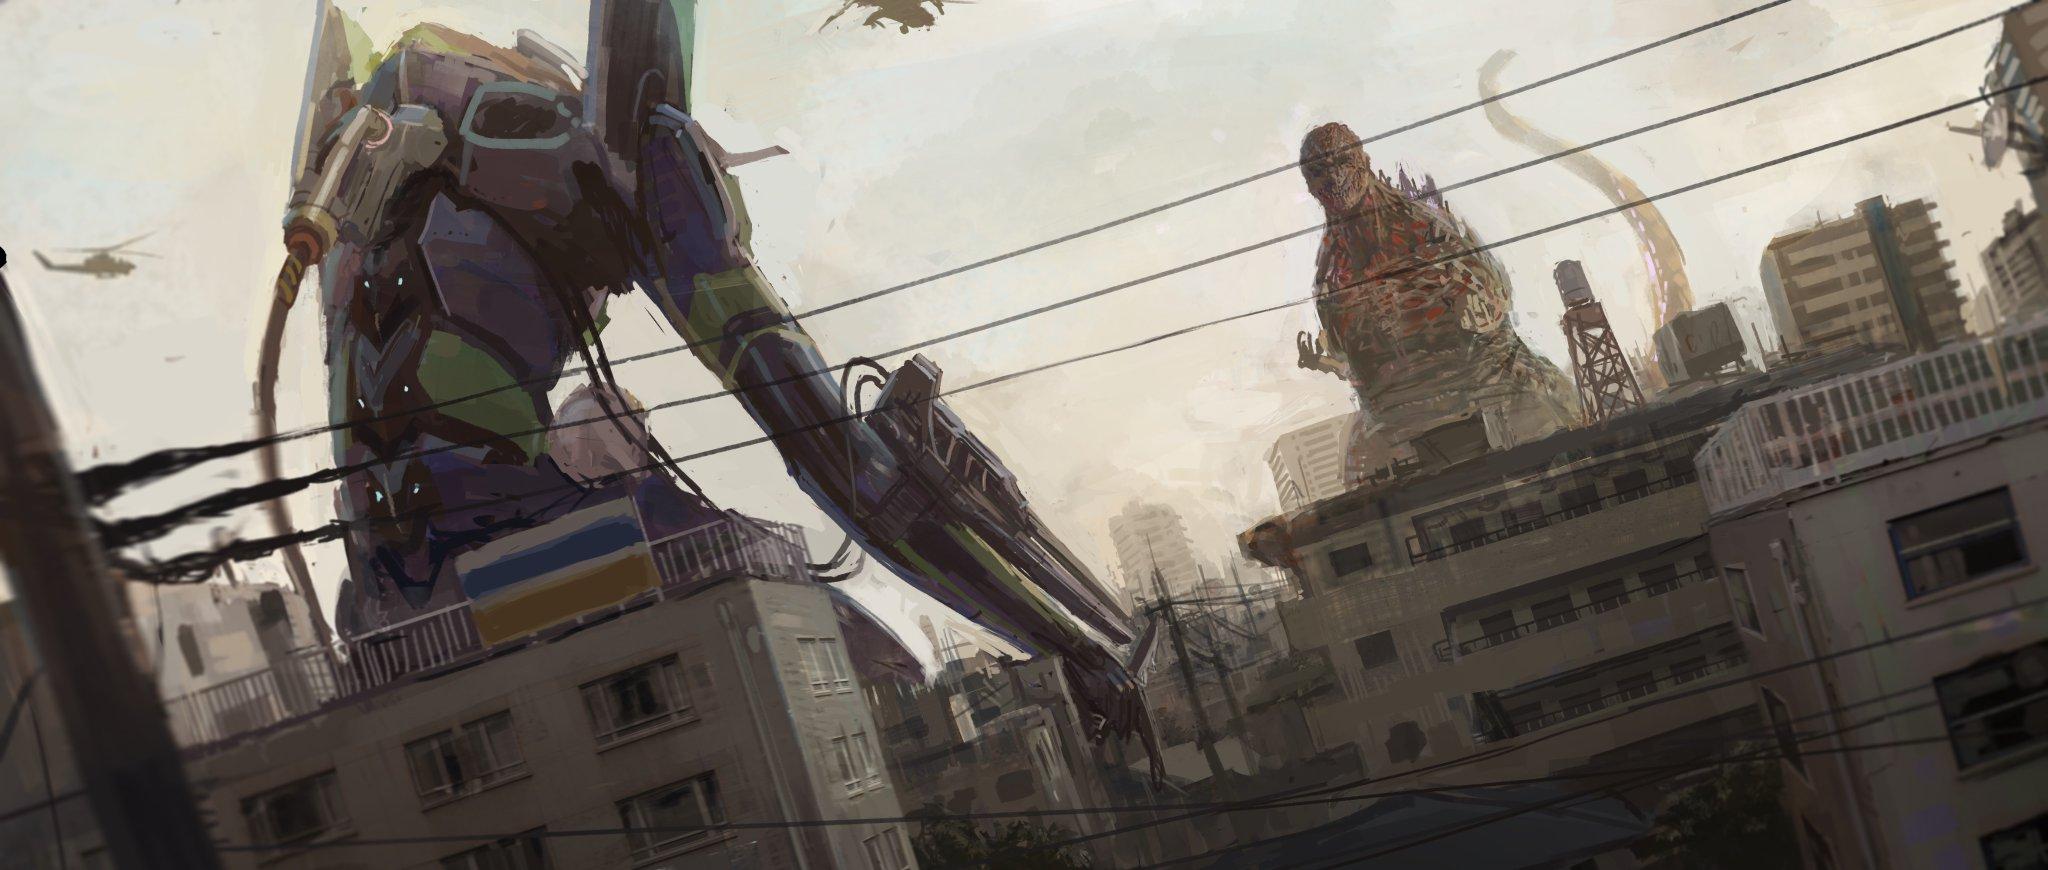 Anime EVA 01 Evangelion godzilla 3343995